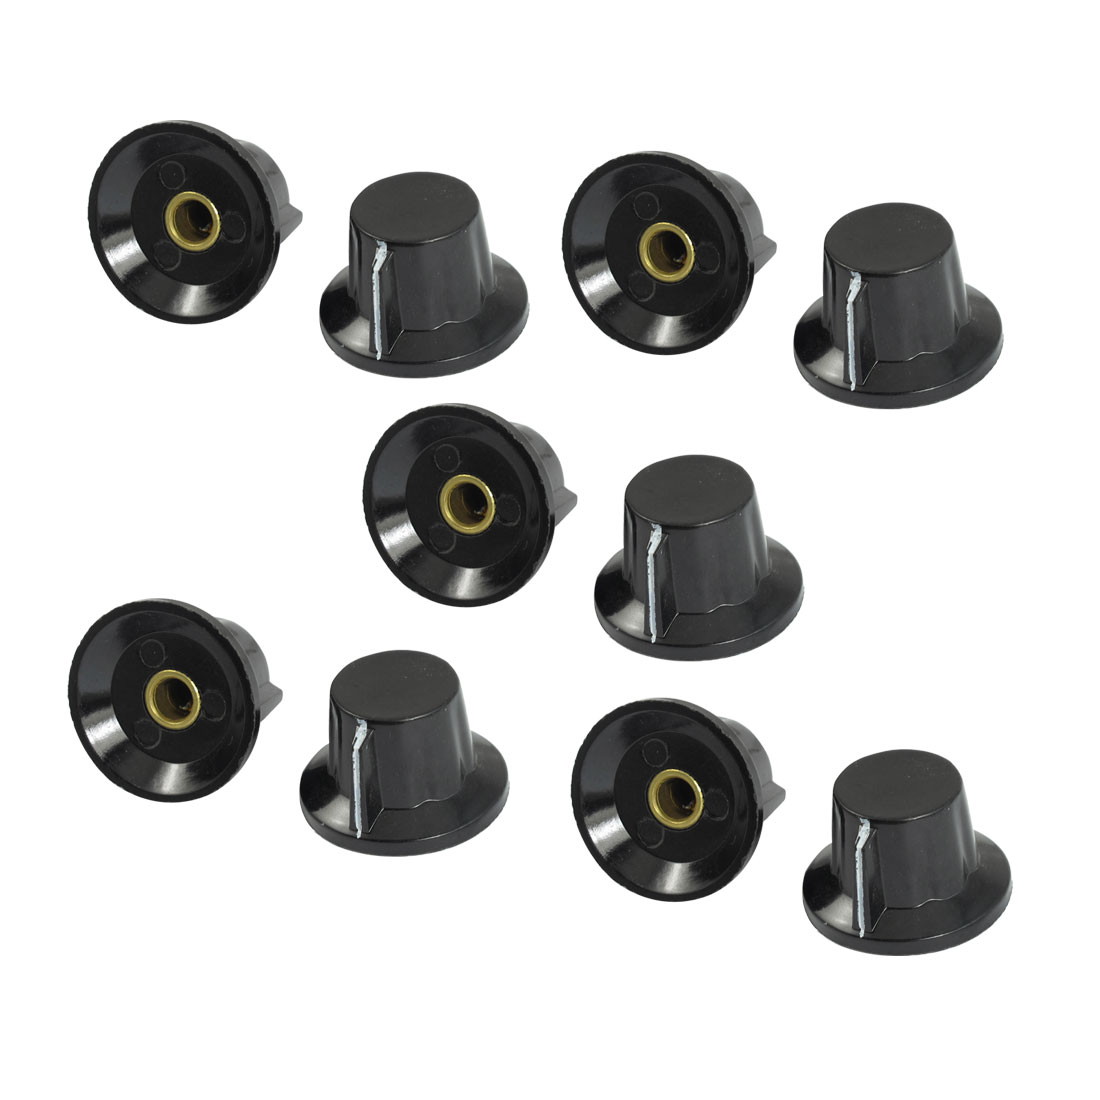 10 Pcs Black 19mm Top 6mm Shaft Insert Dia Potentiometer Rotary Knobs